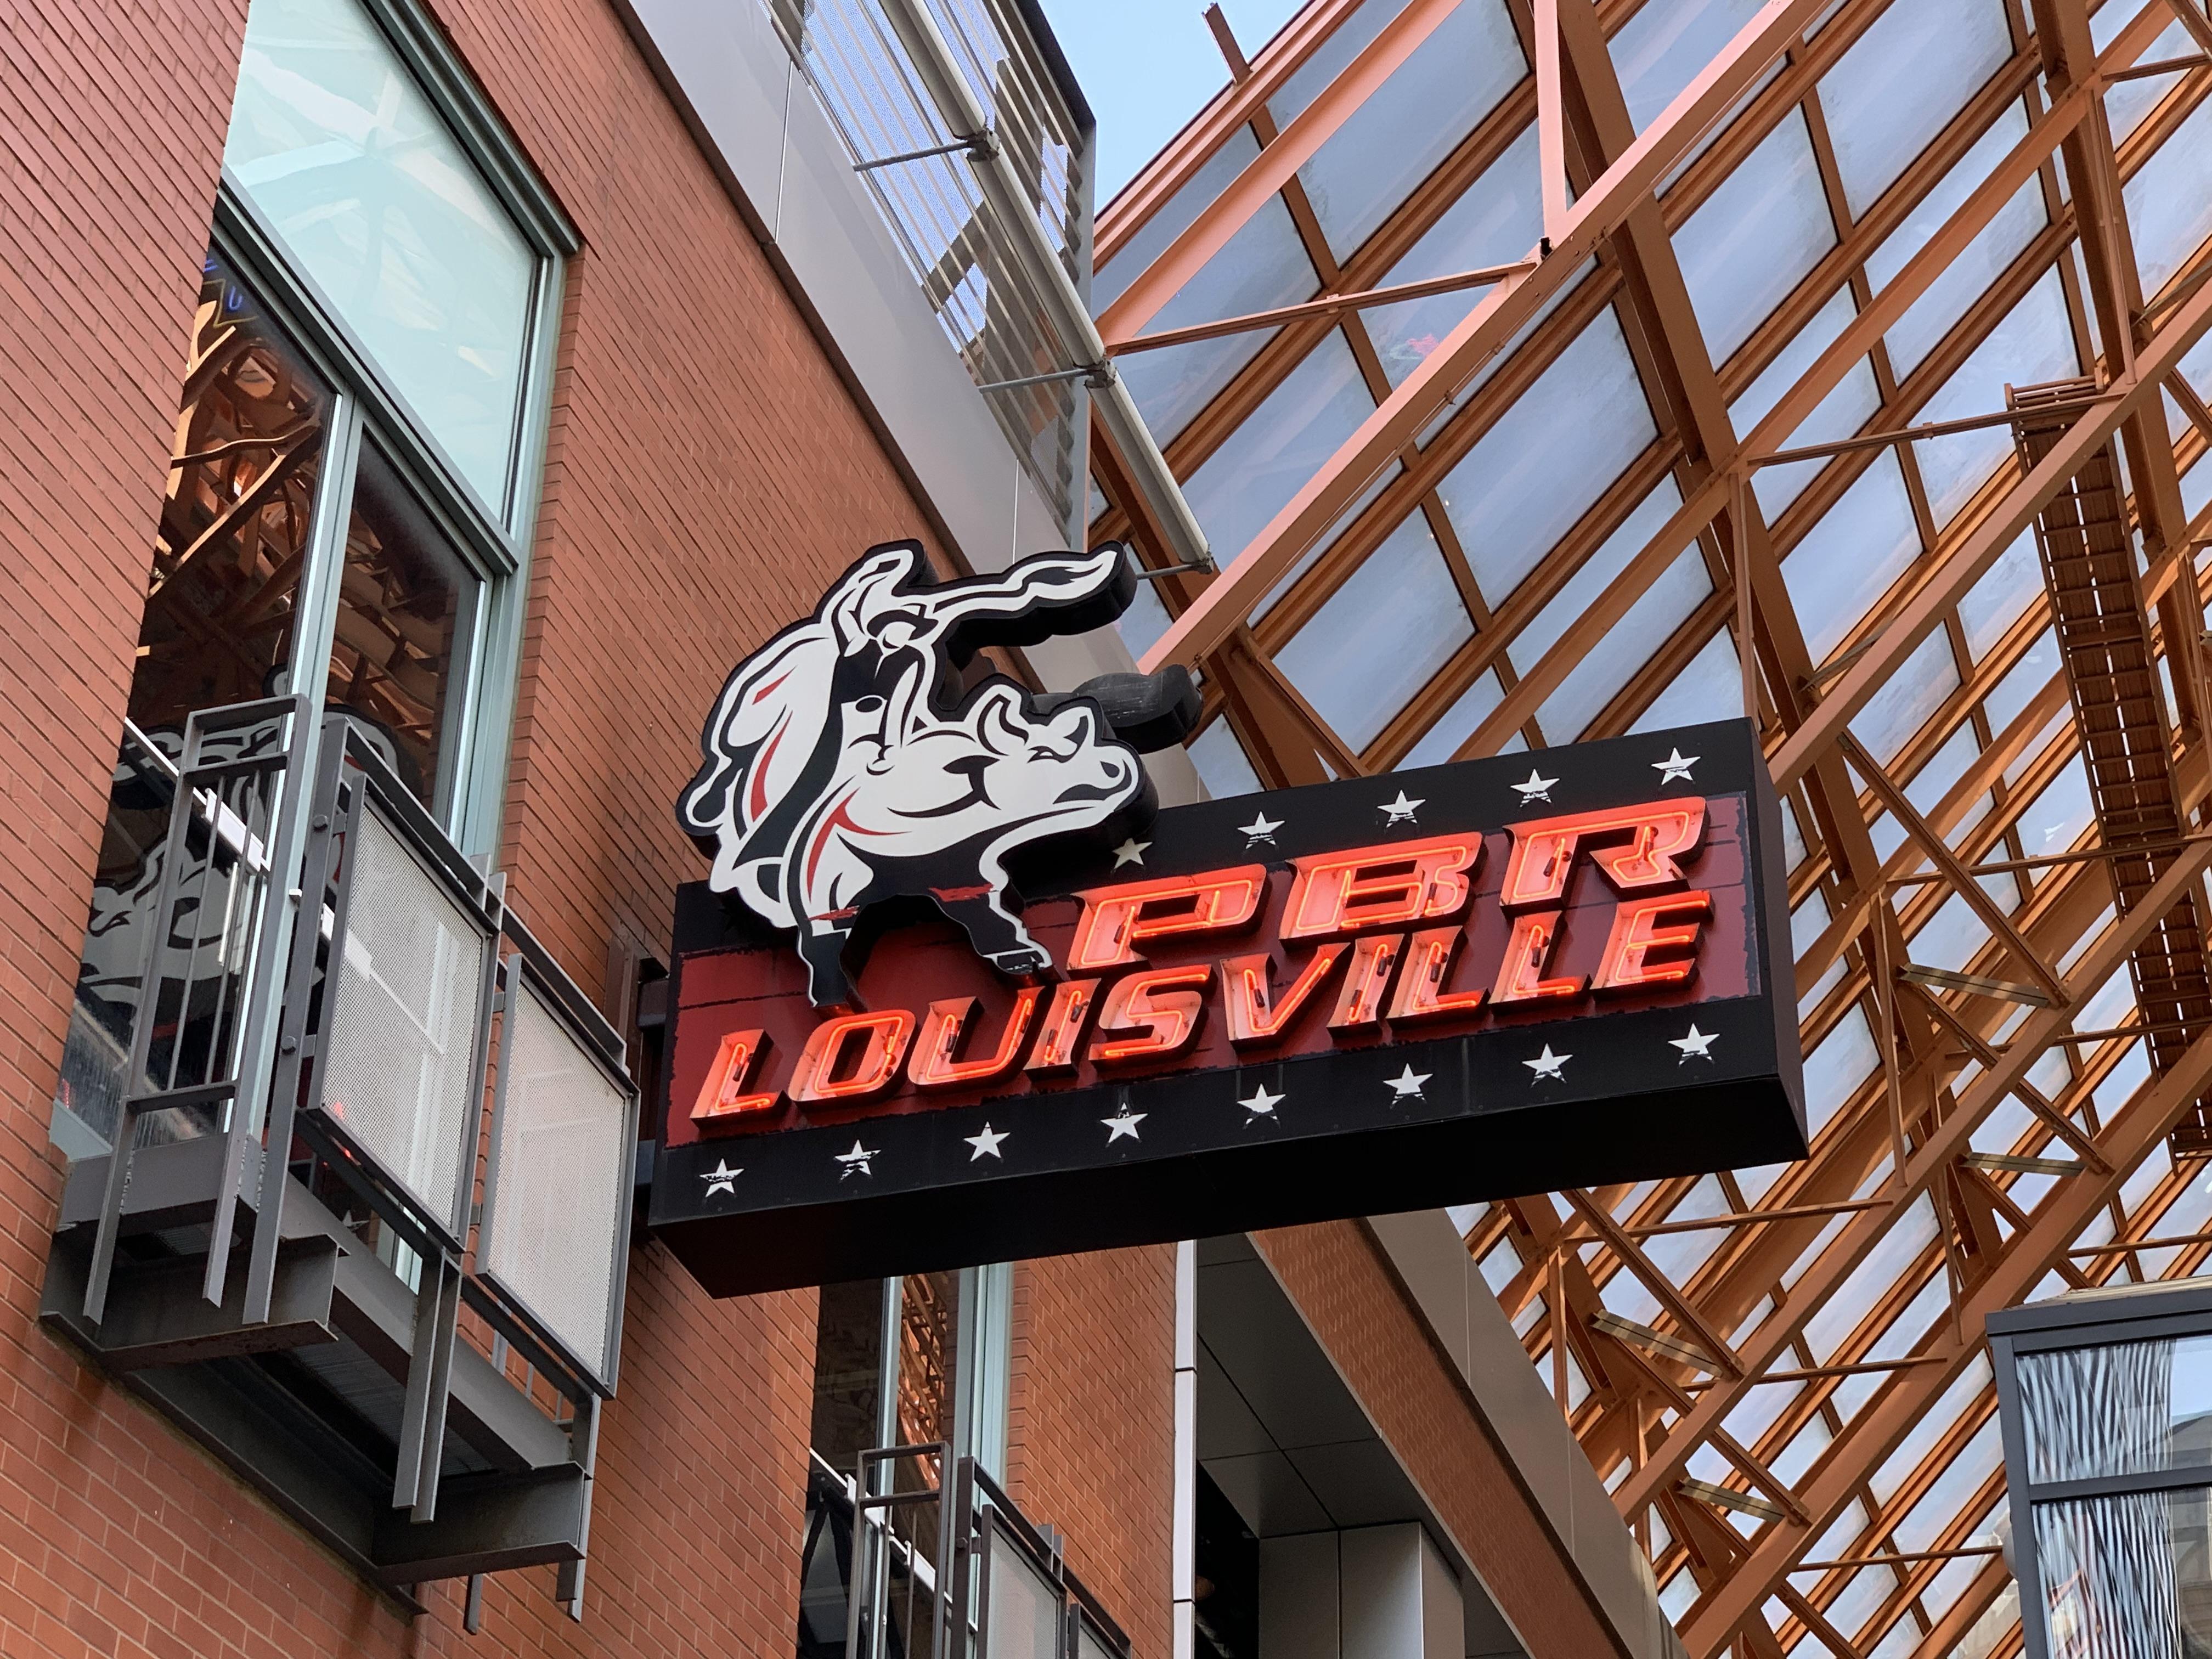 Visiting Louisville